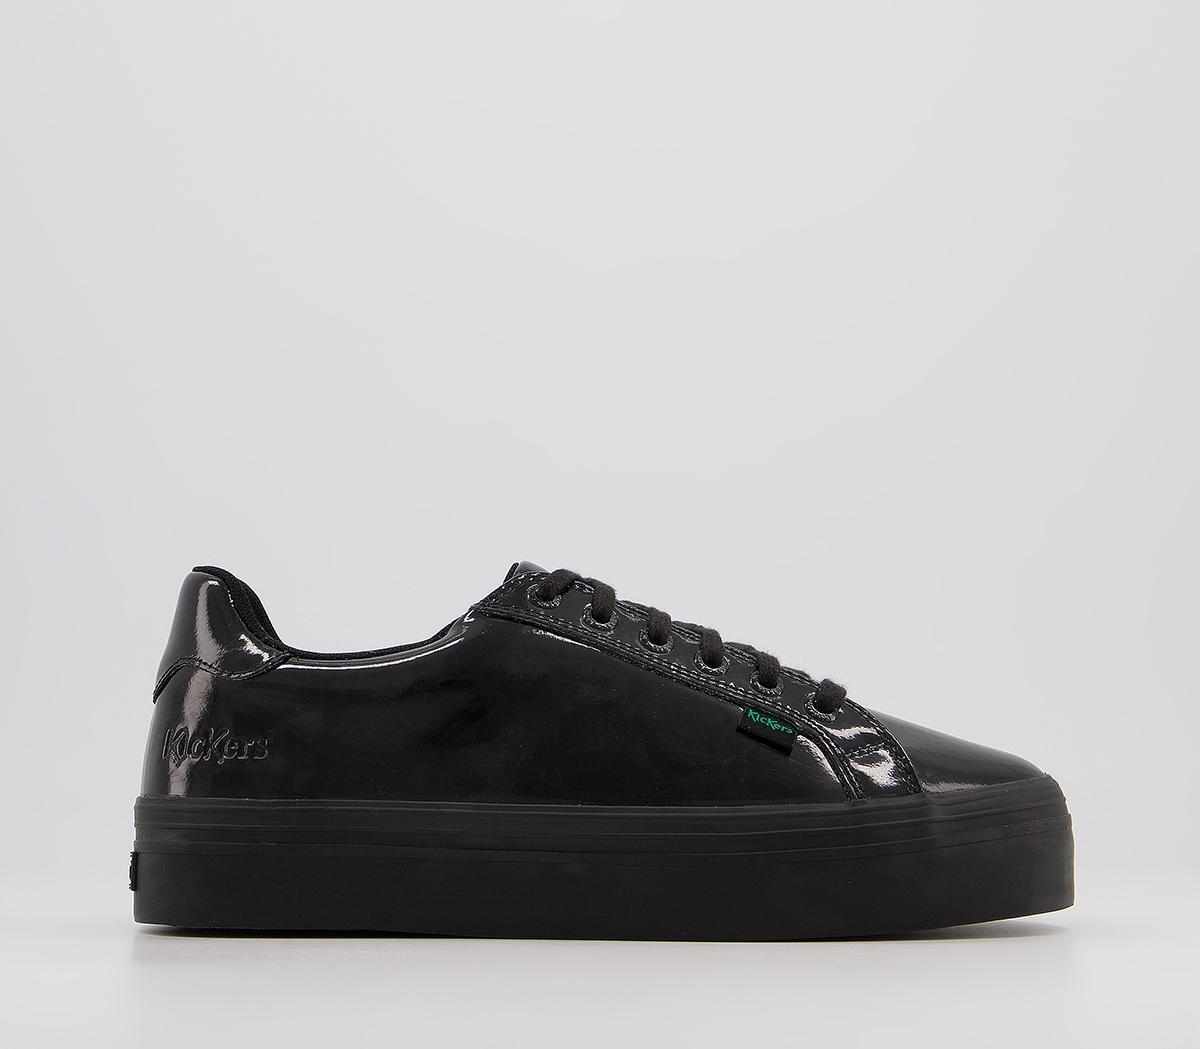 Tovni Platform Patent Shoes